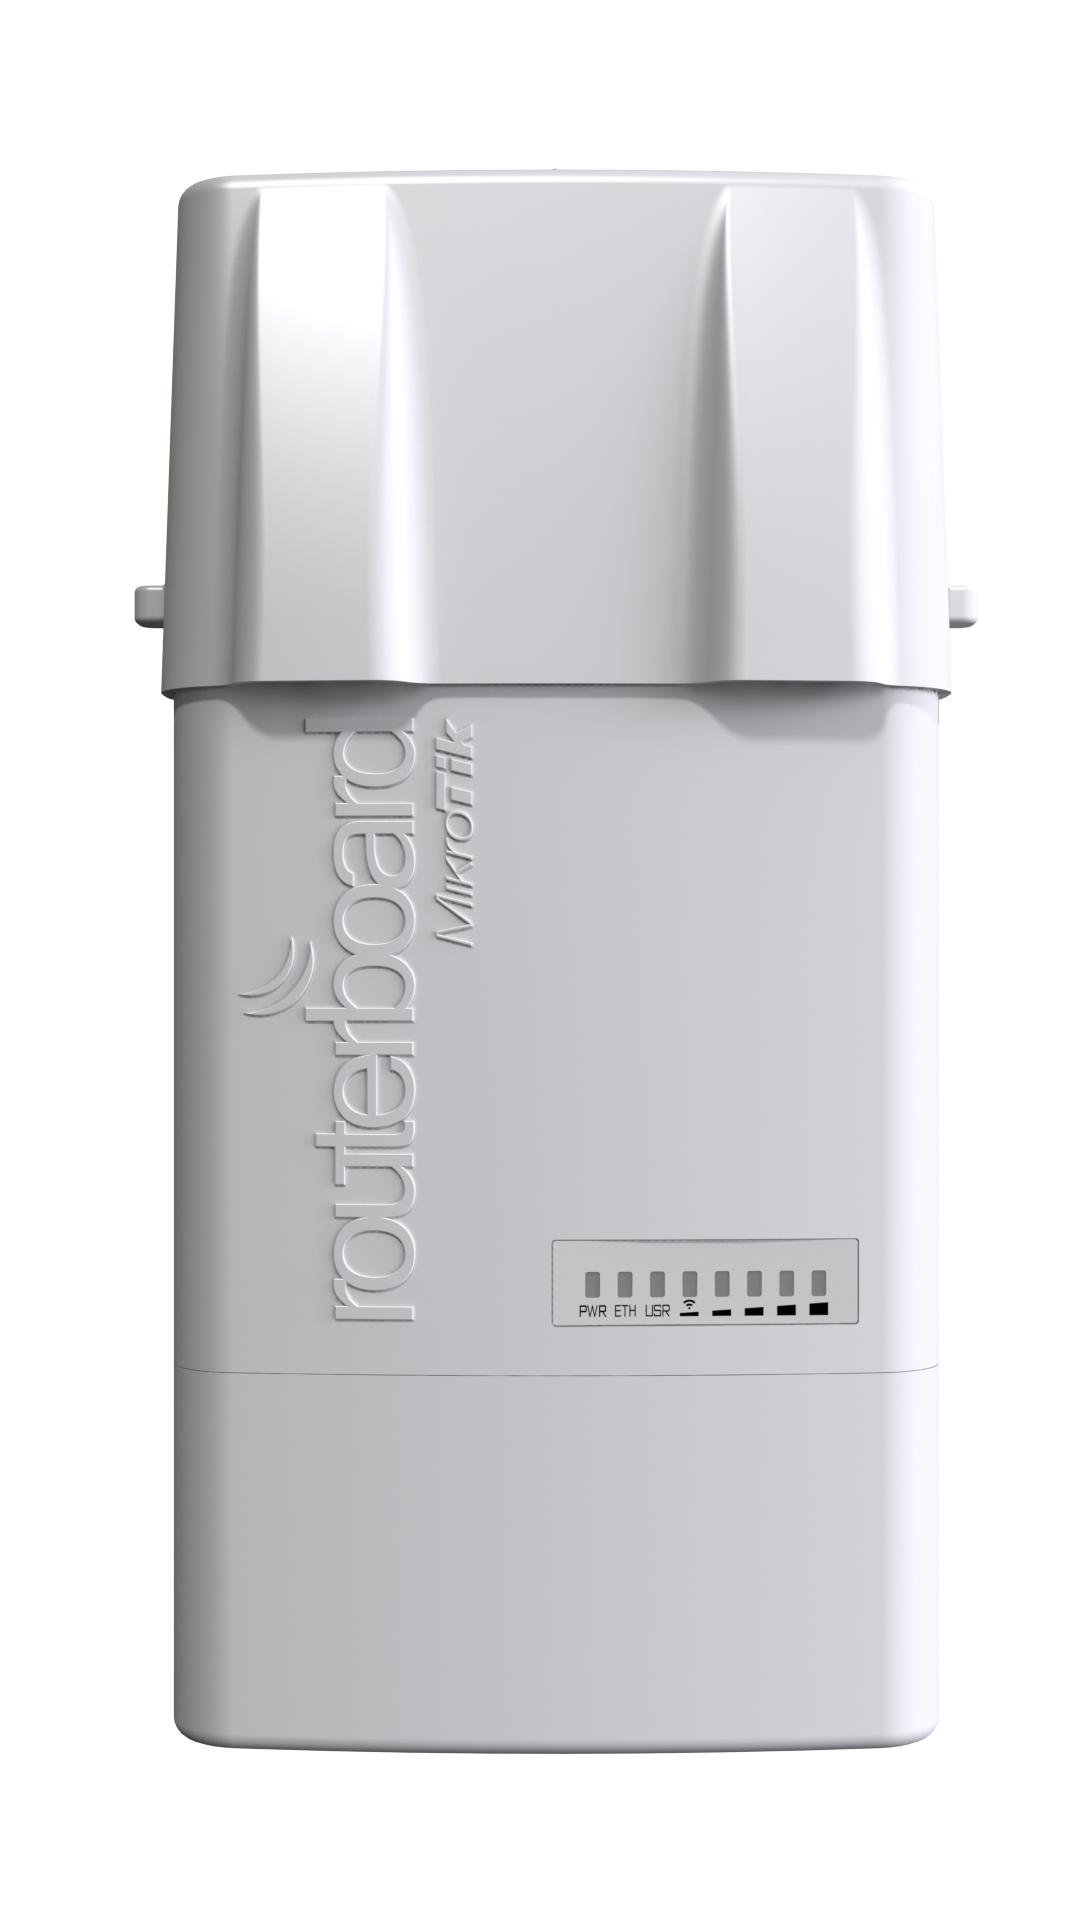 Mikrotik NetBox 5 Power over Ethernet (PoE) White WLAN access point